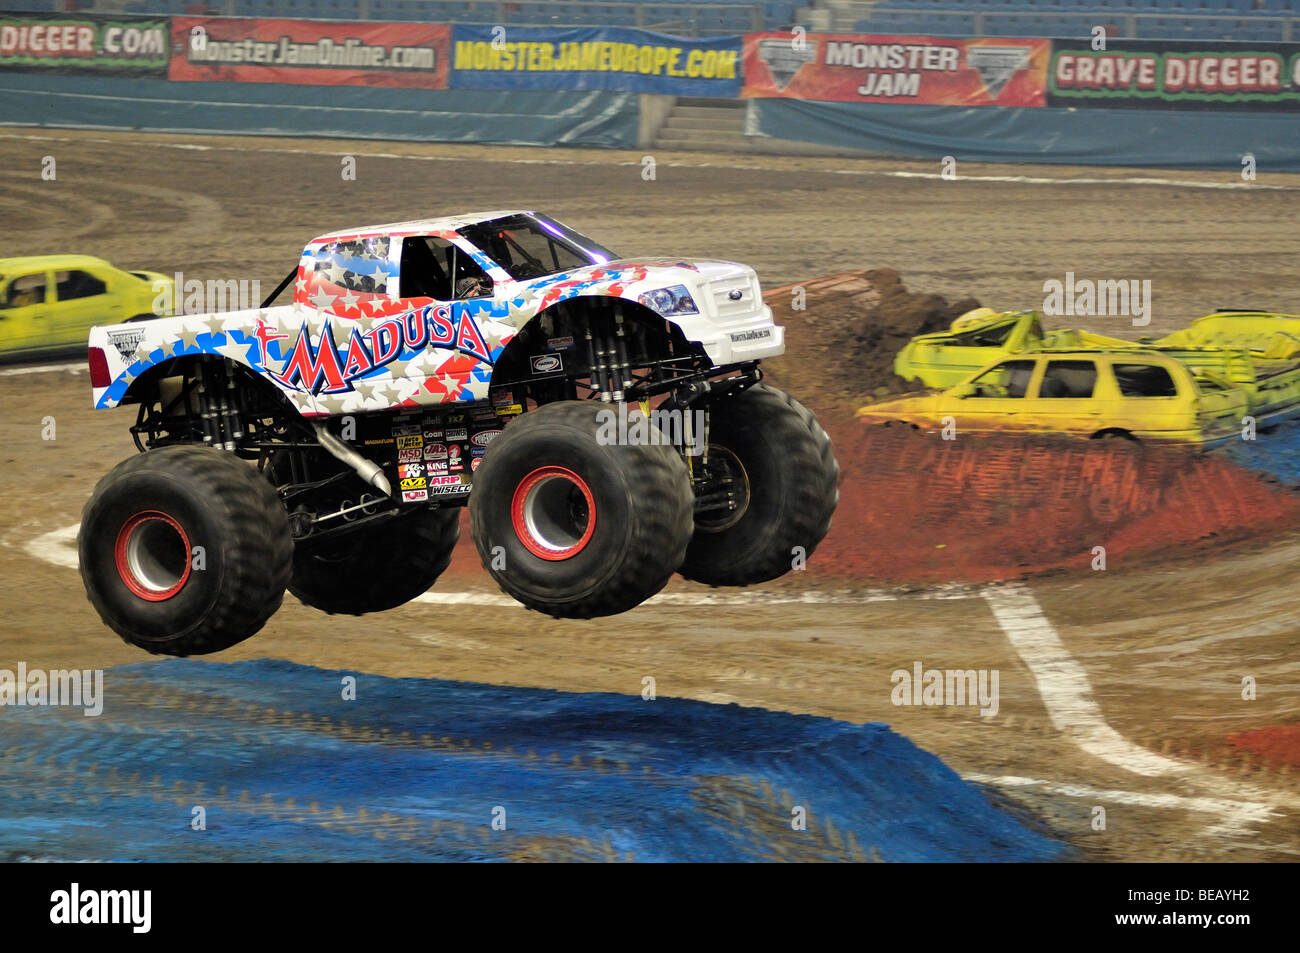 Monster Jam Madusa Stock Photo Alamy